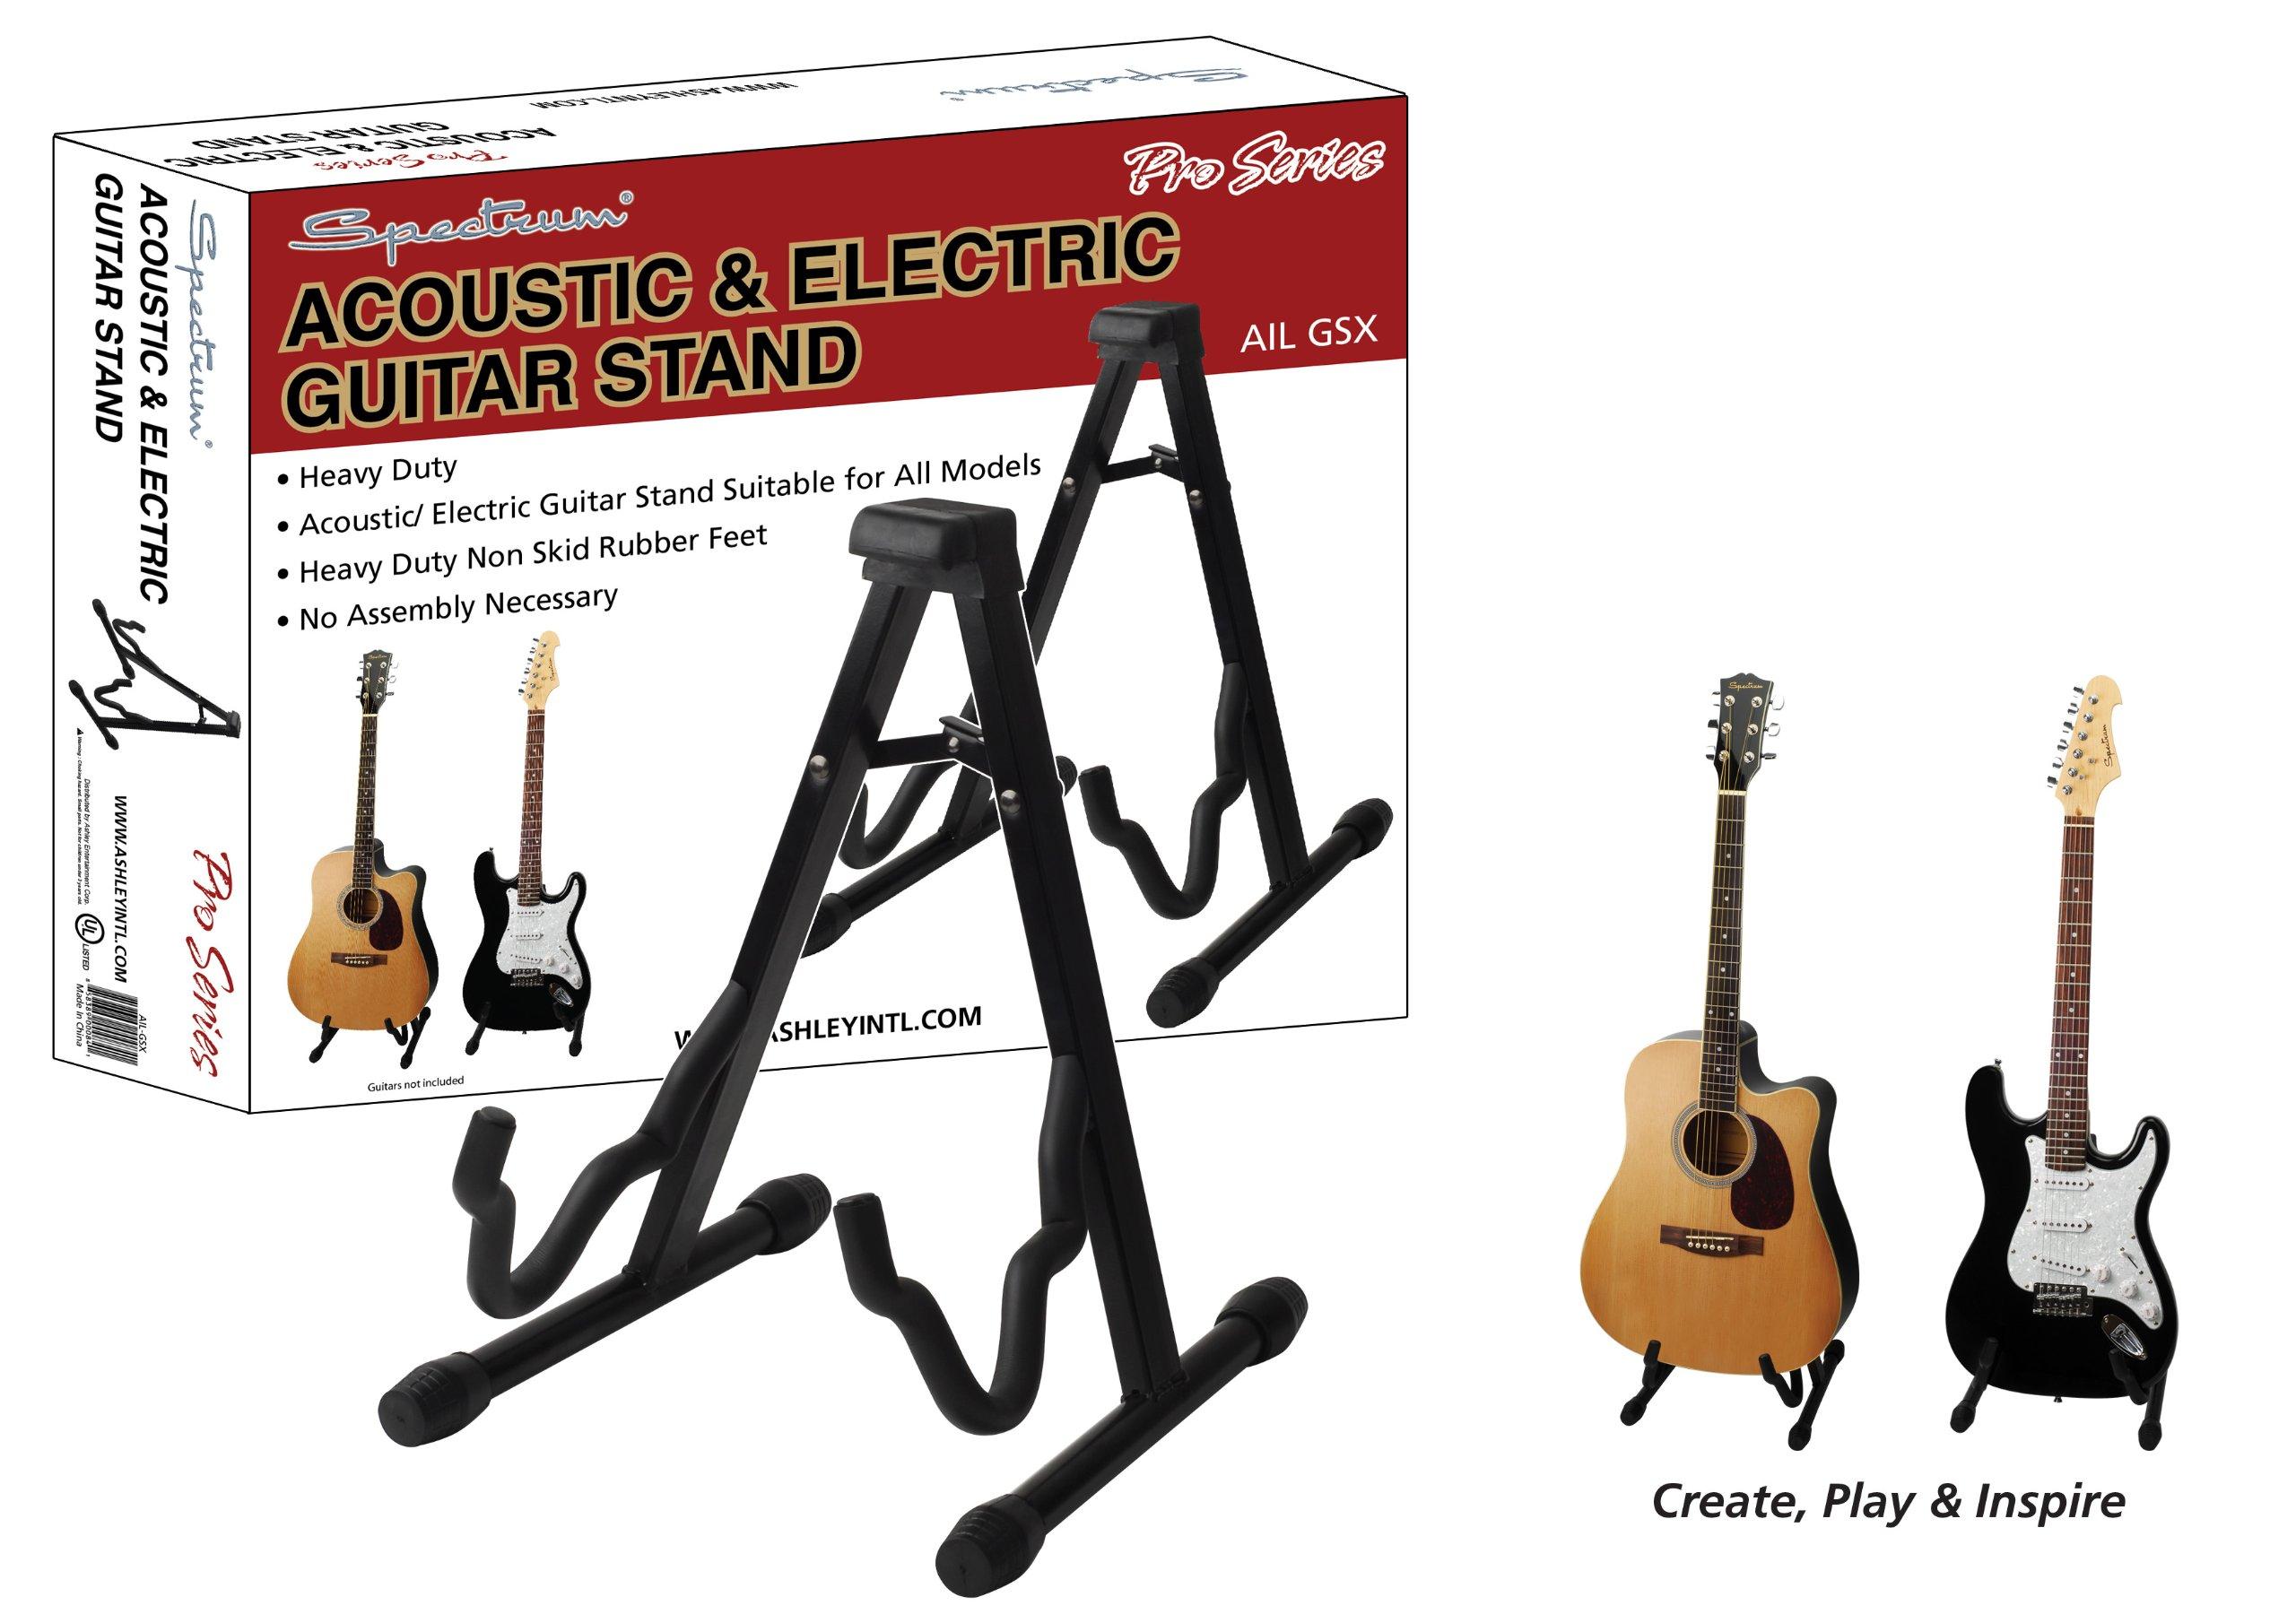 Spectrum AIL GSX Universal Guitar Stand